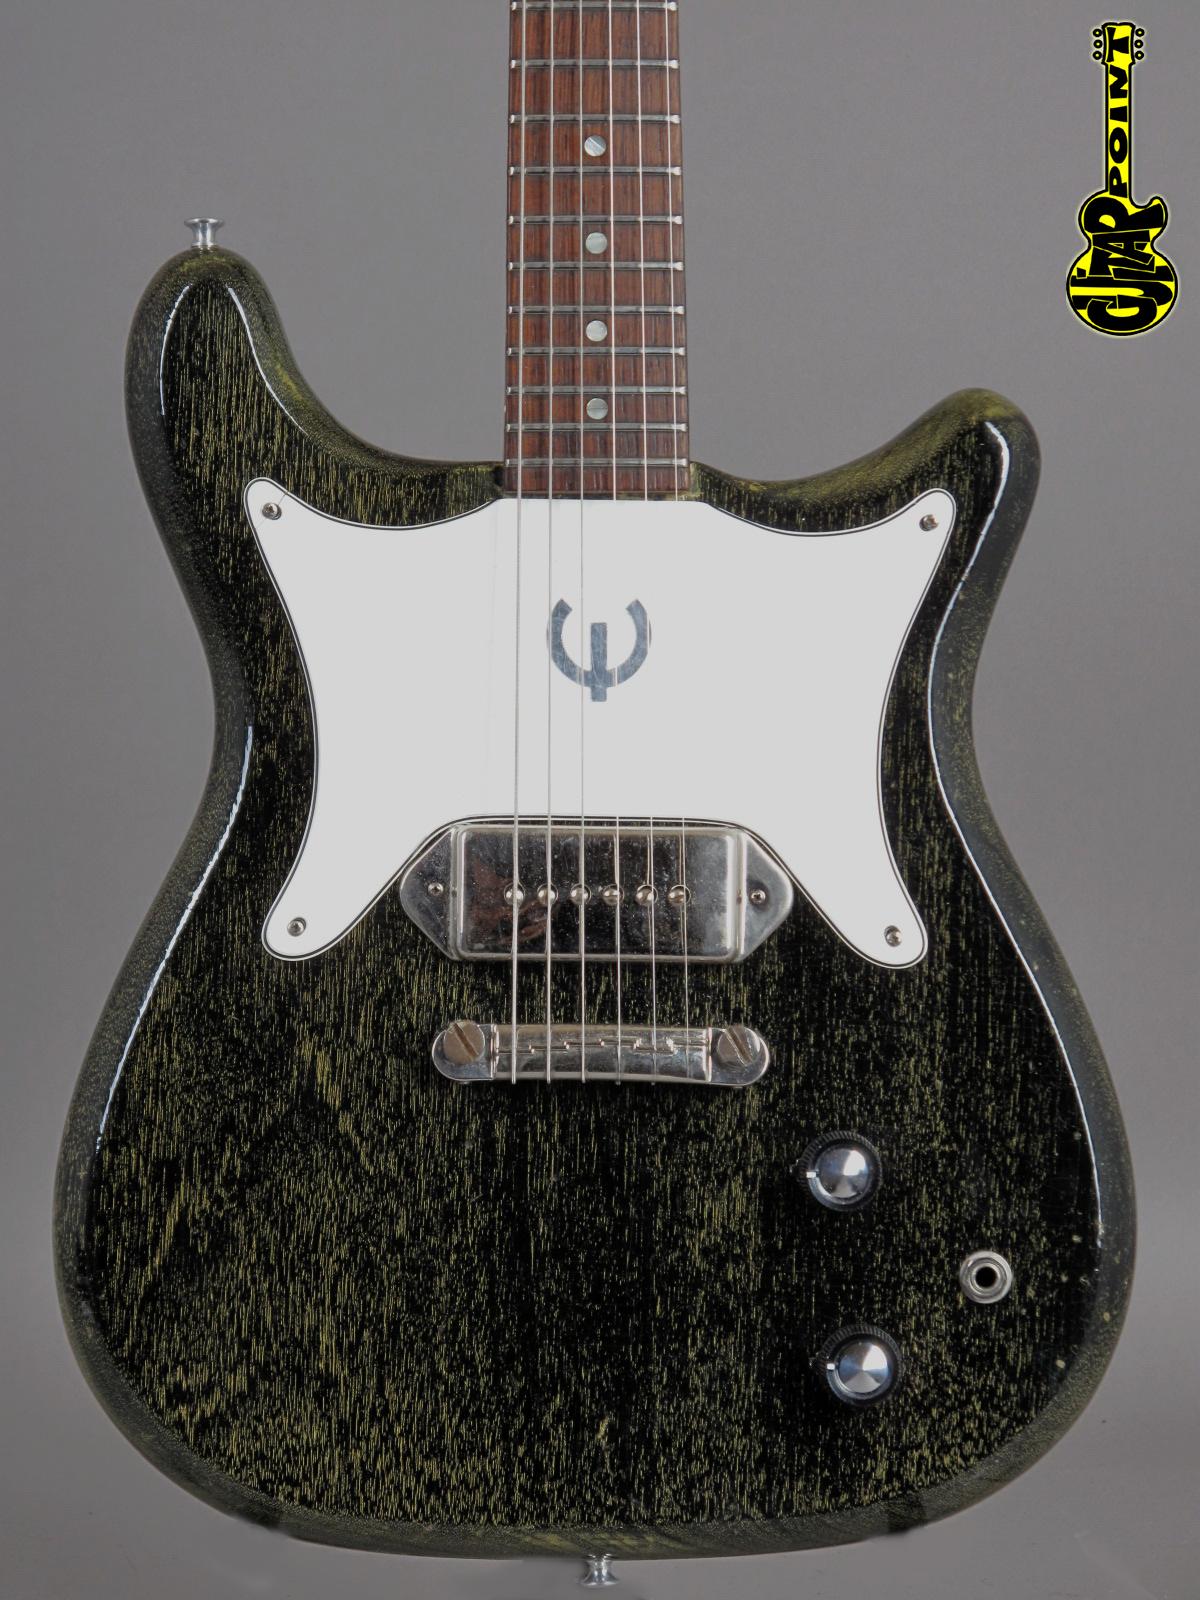 1964 Epiphone Coronet - Silver Fox